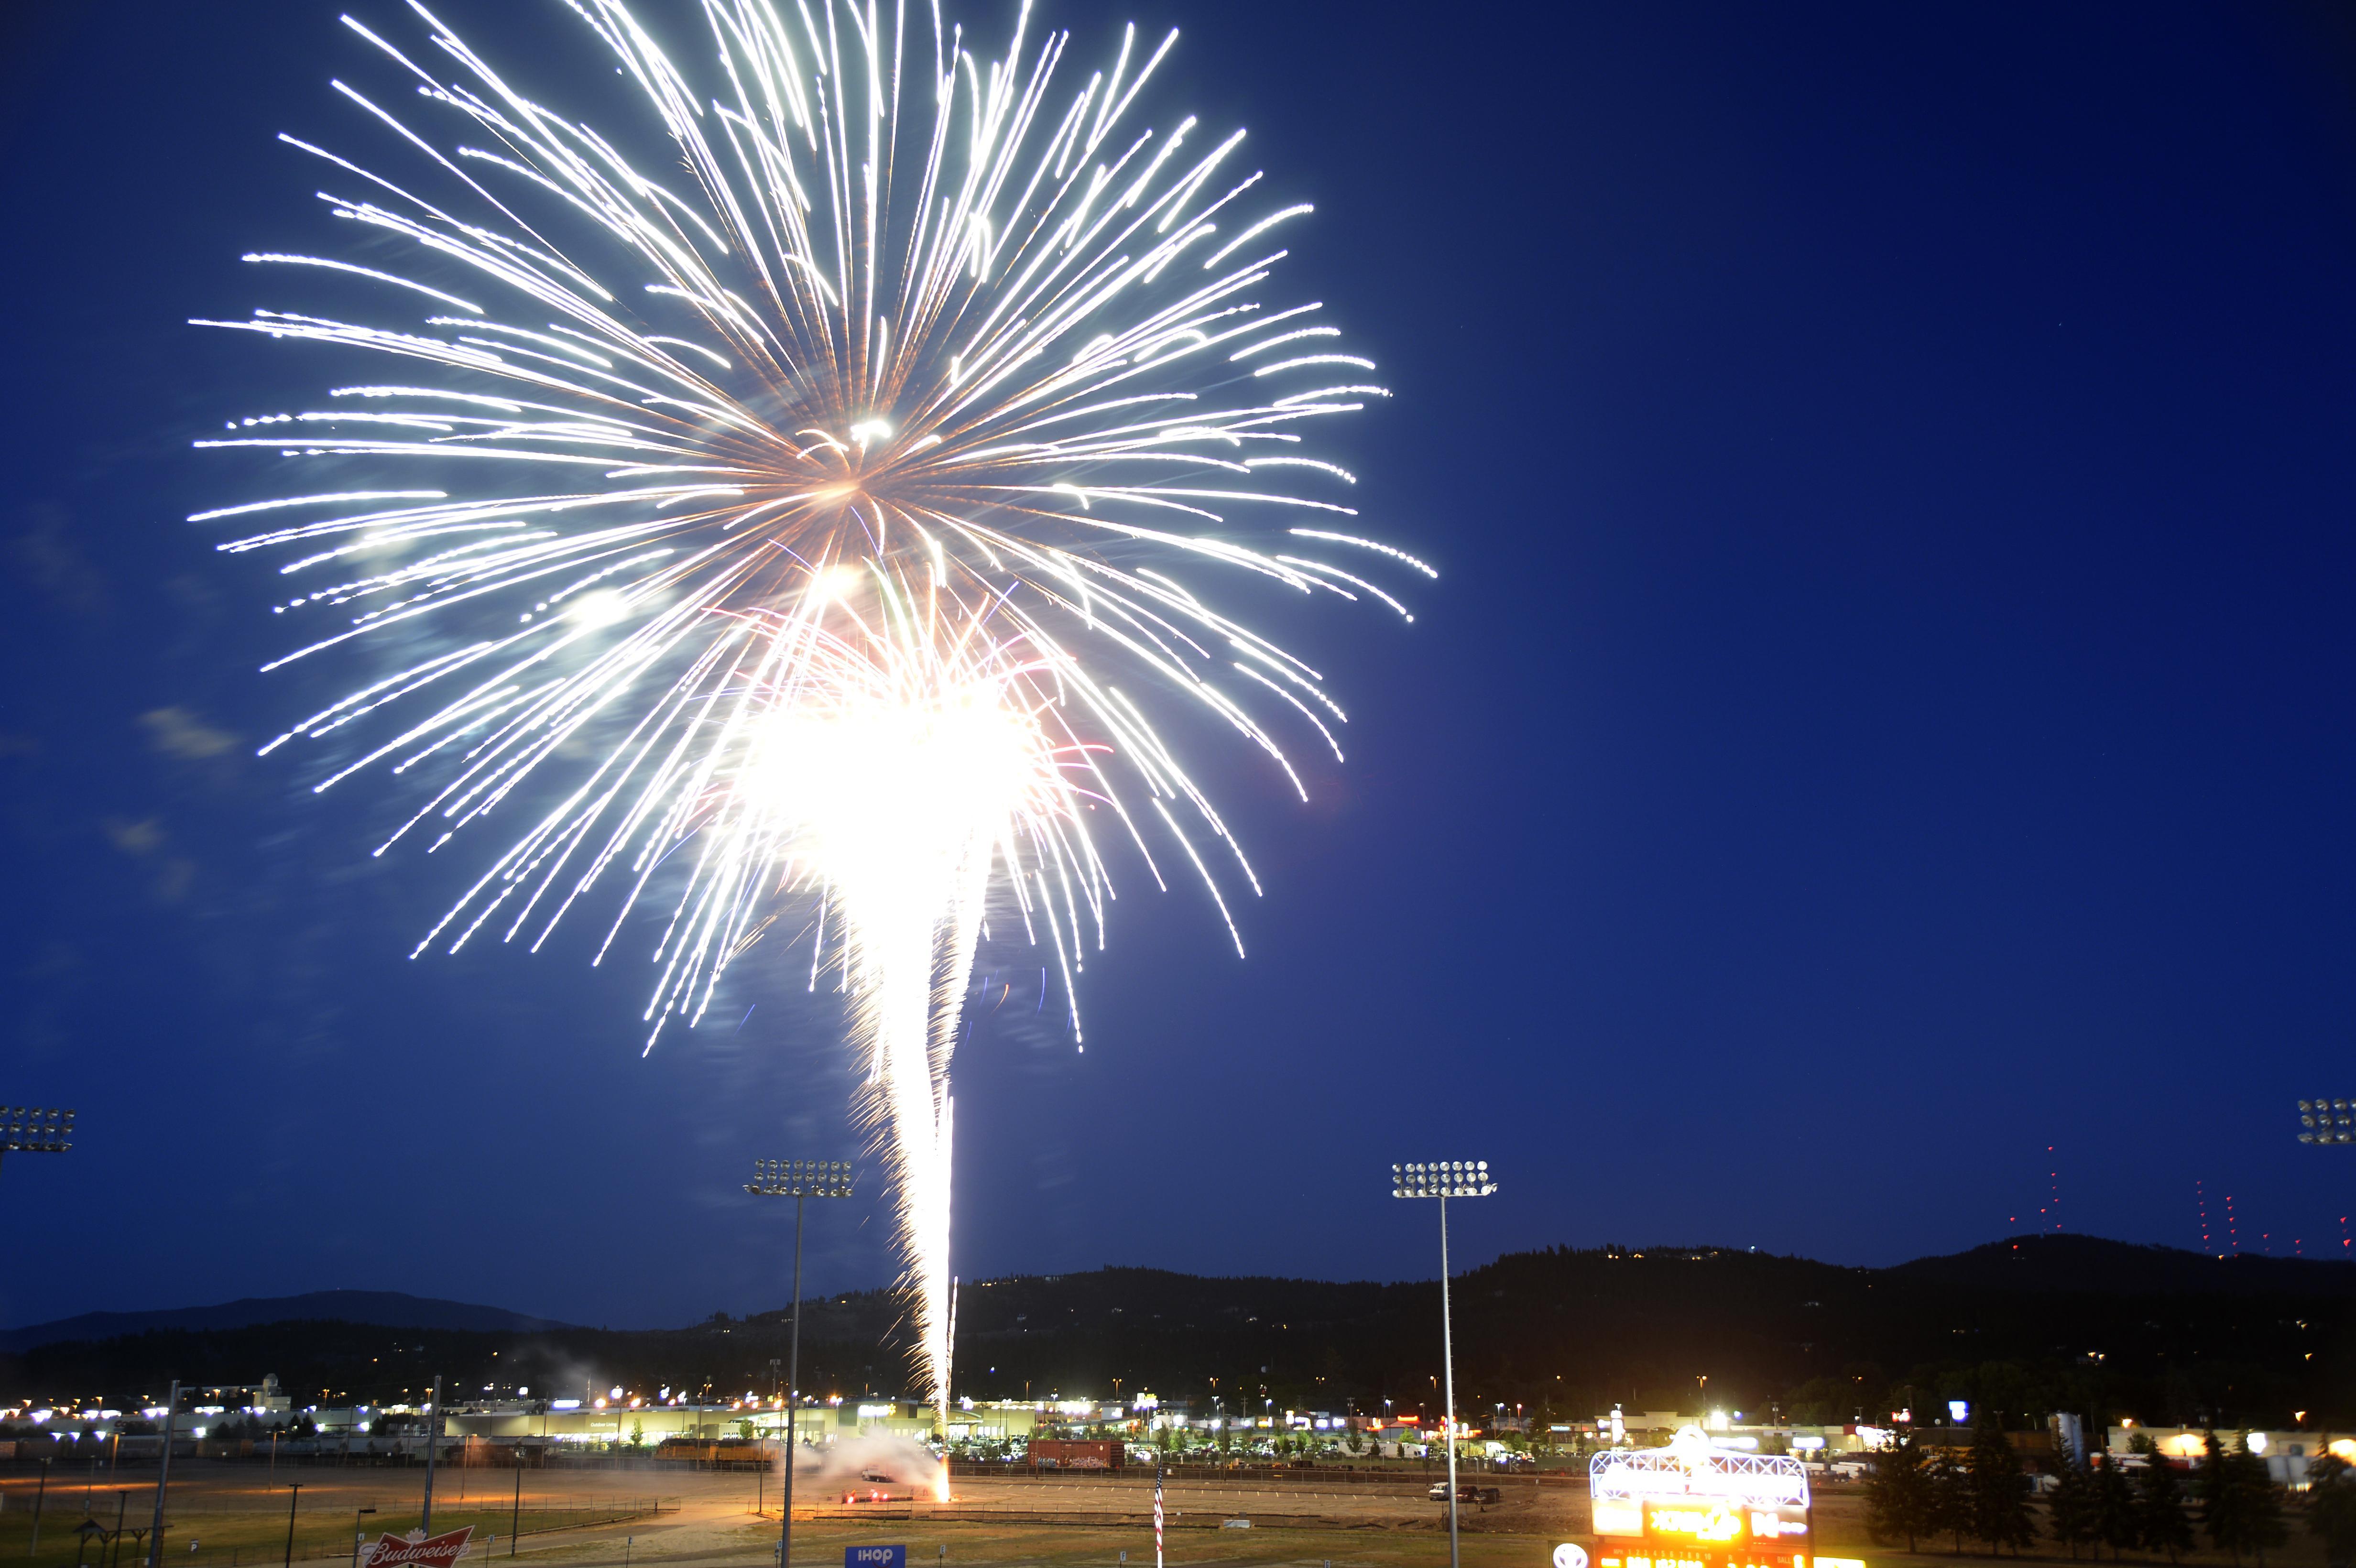 Boise officials to seek restitution if fireworks spark blaze